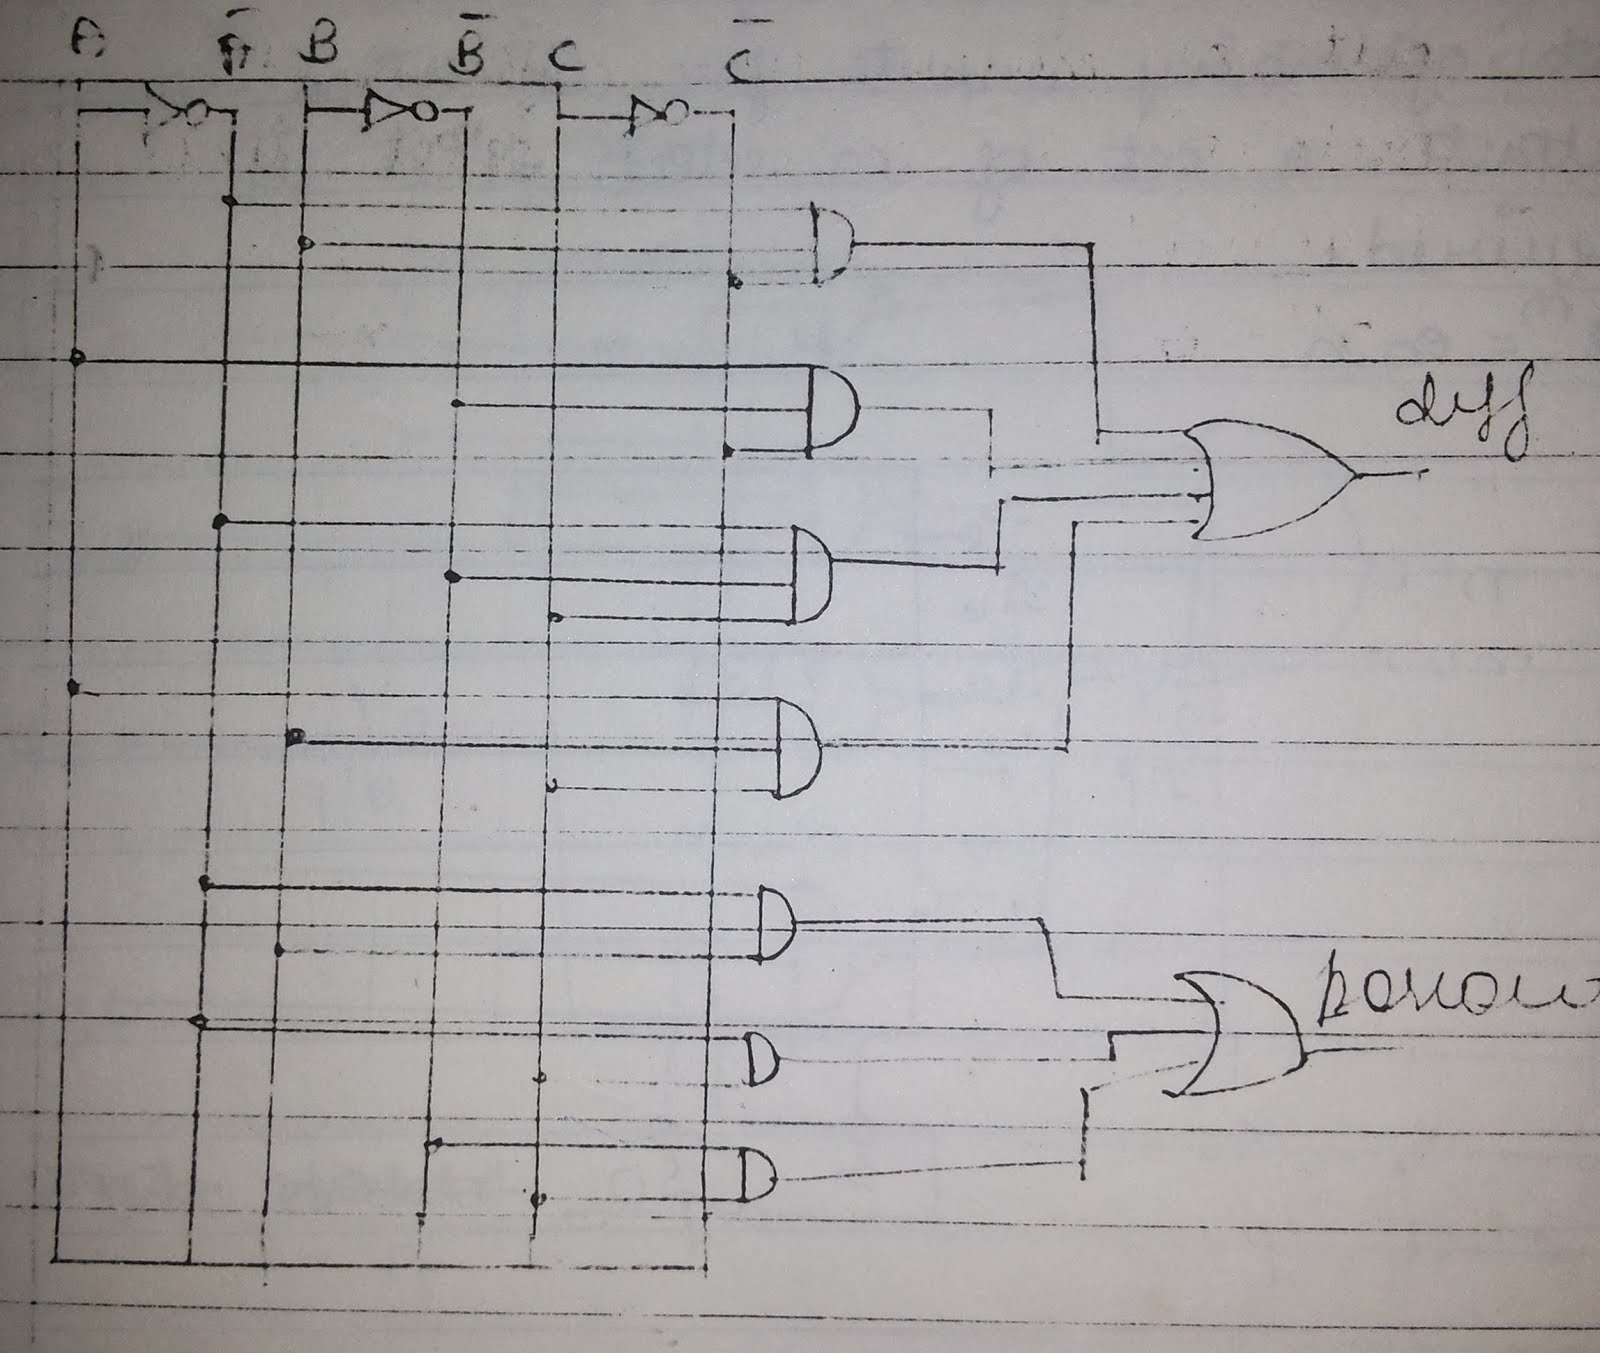 hight resolution of logic diagram of full subtractor circuit